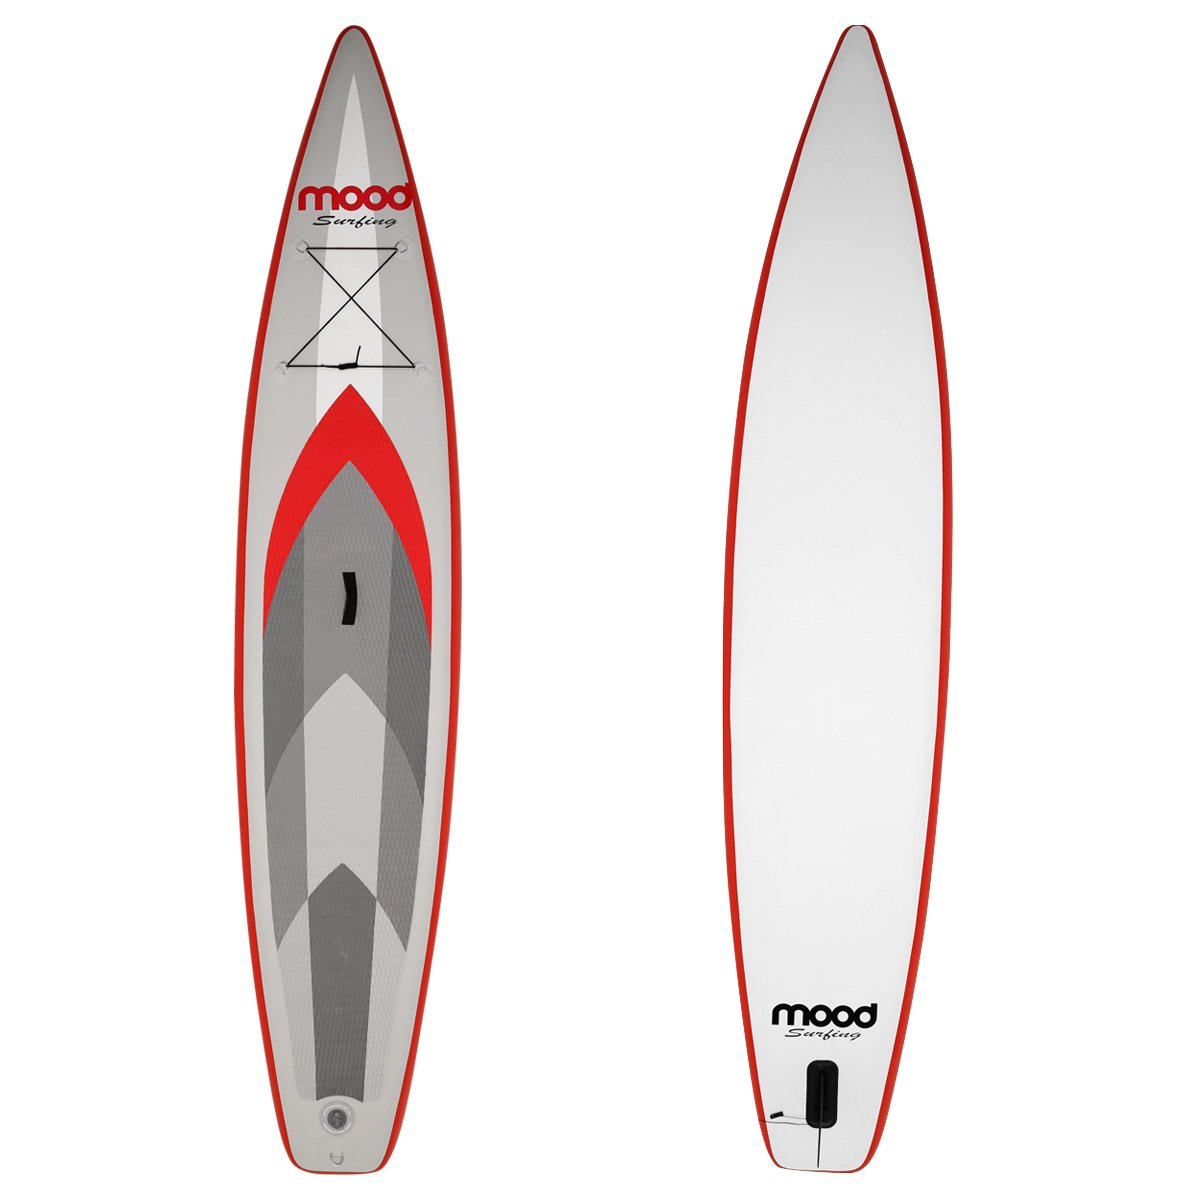 f5ed482f0 Prancha Stand Up Paddle Mood Inflável Navigator Line 12 pés